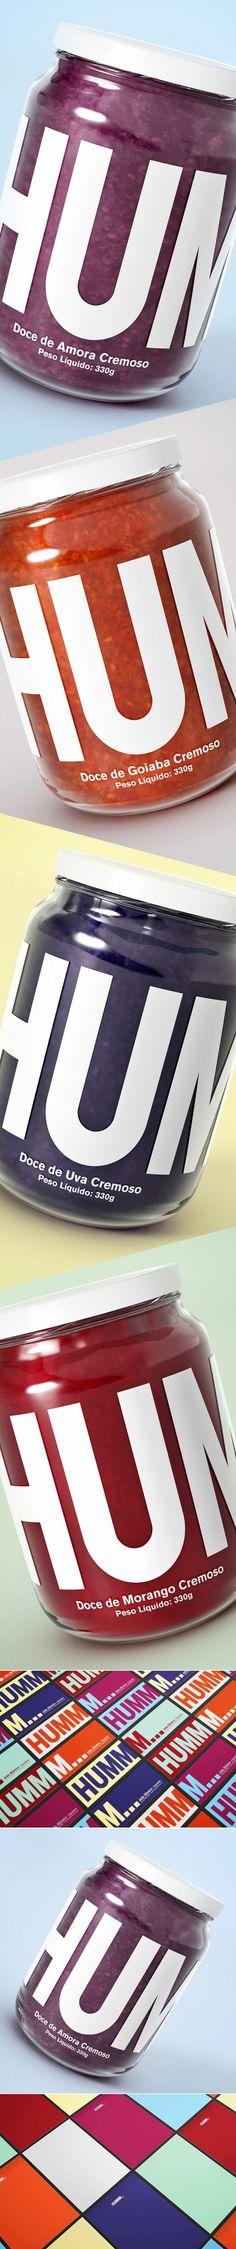 HUMM... — The Dieline | Packaging & Branding Design & Innovation News